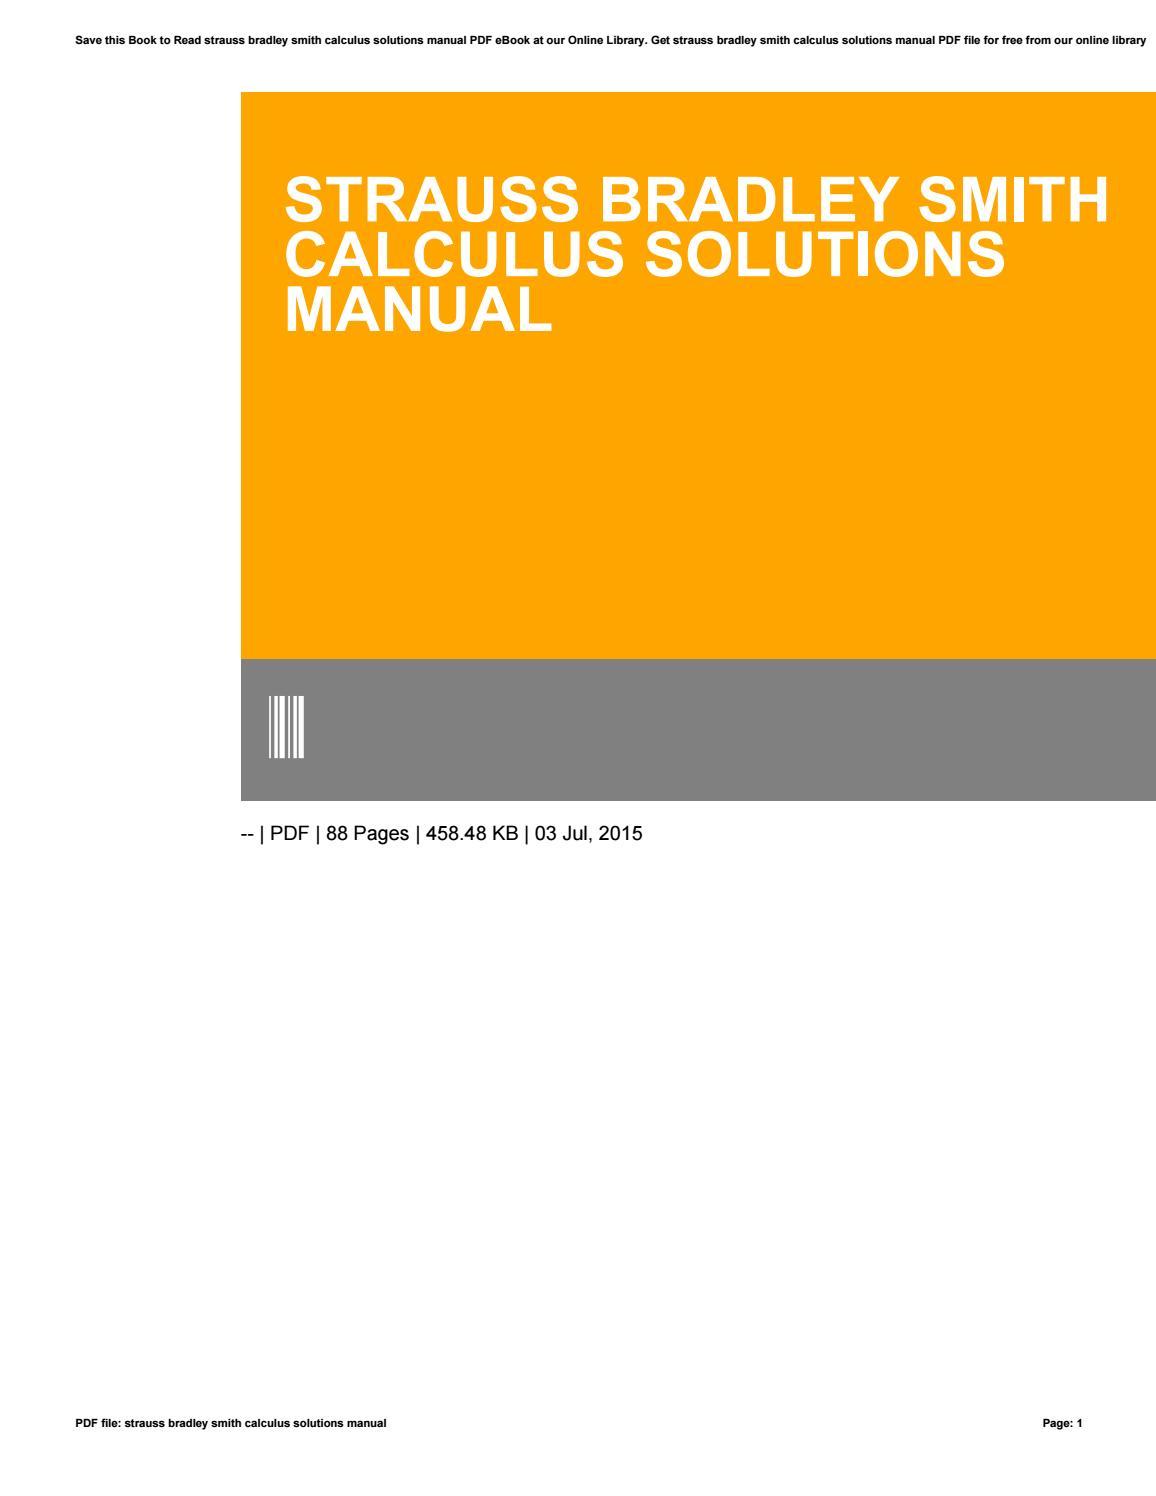 Strauss bradley smith calculus solutions manual by BrendaGuerra2702 - issuu